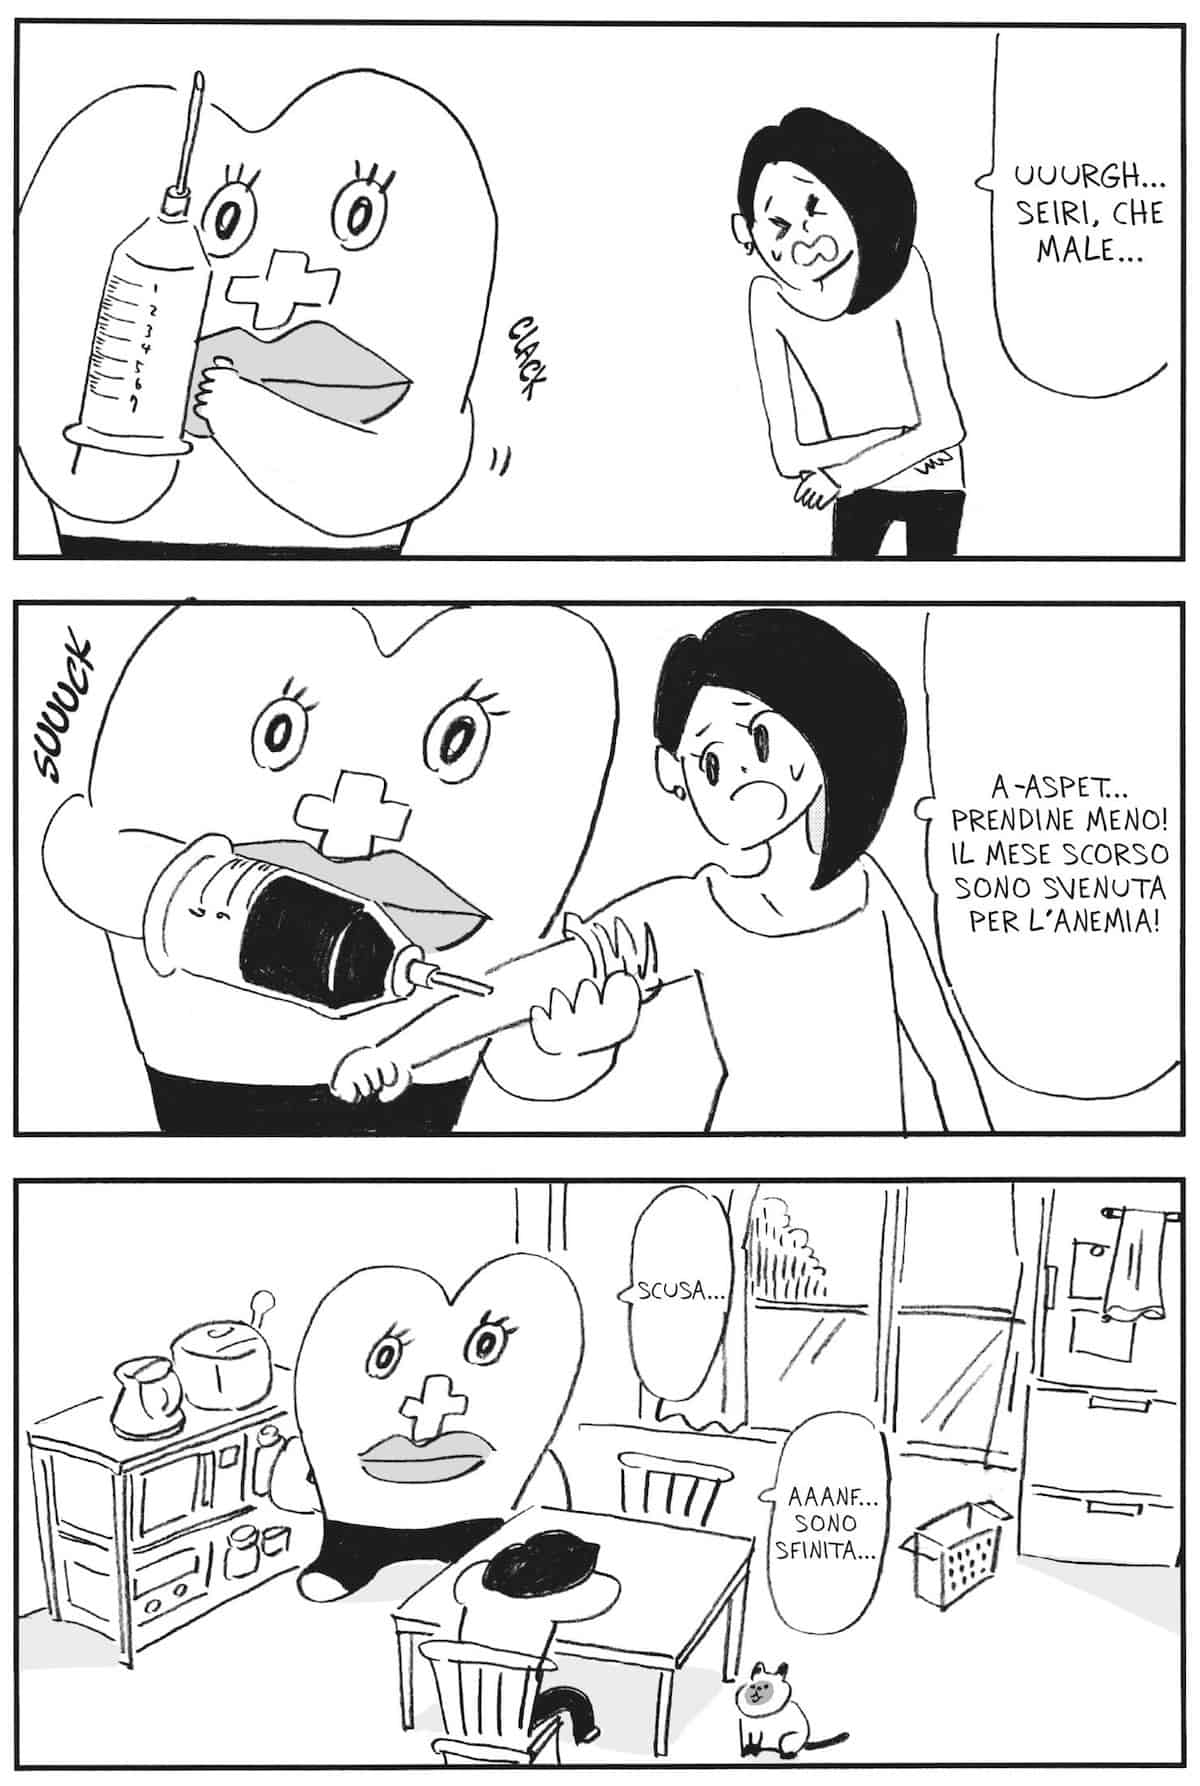 seiri chan manga mestruazioni